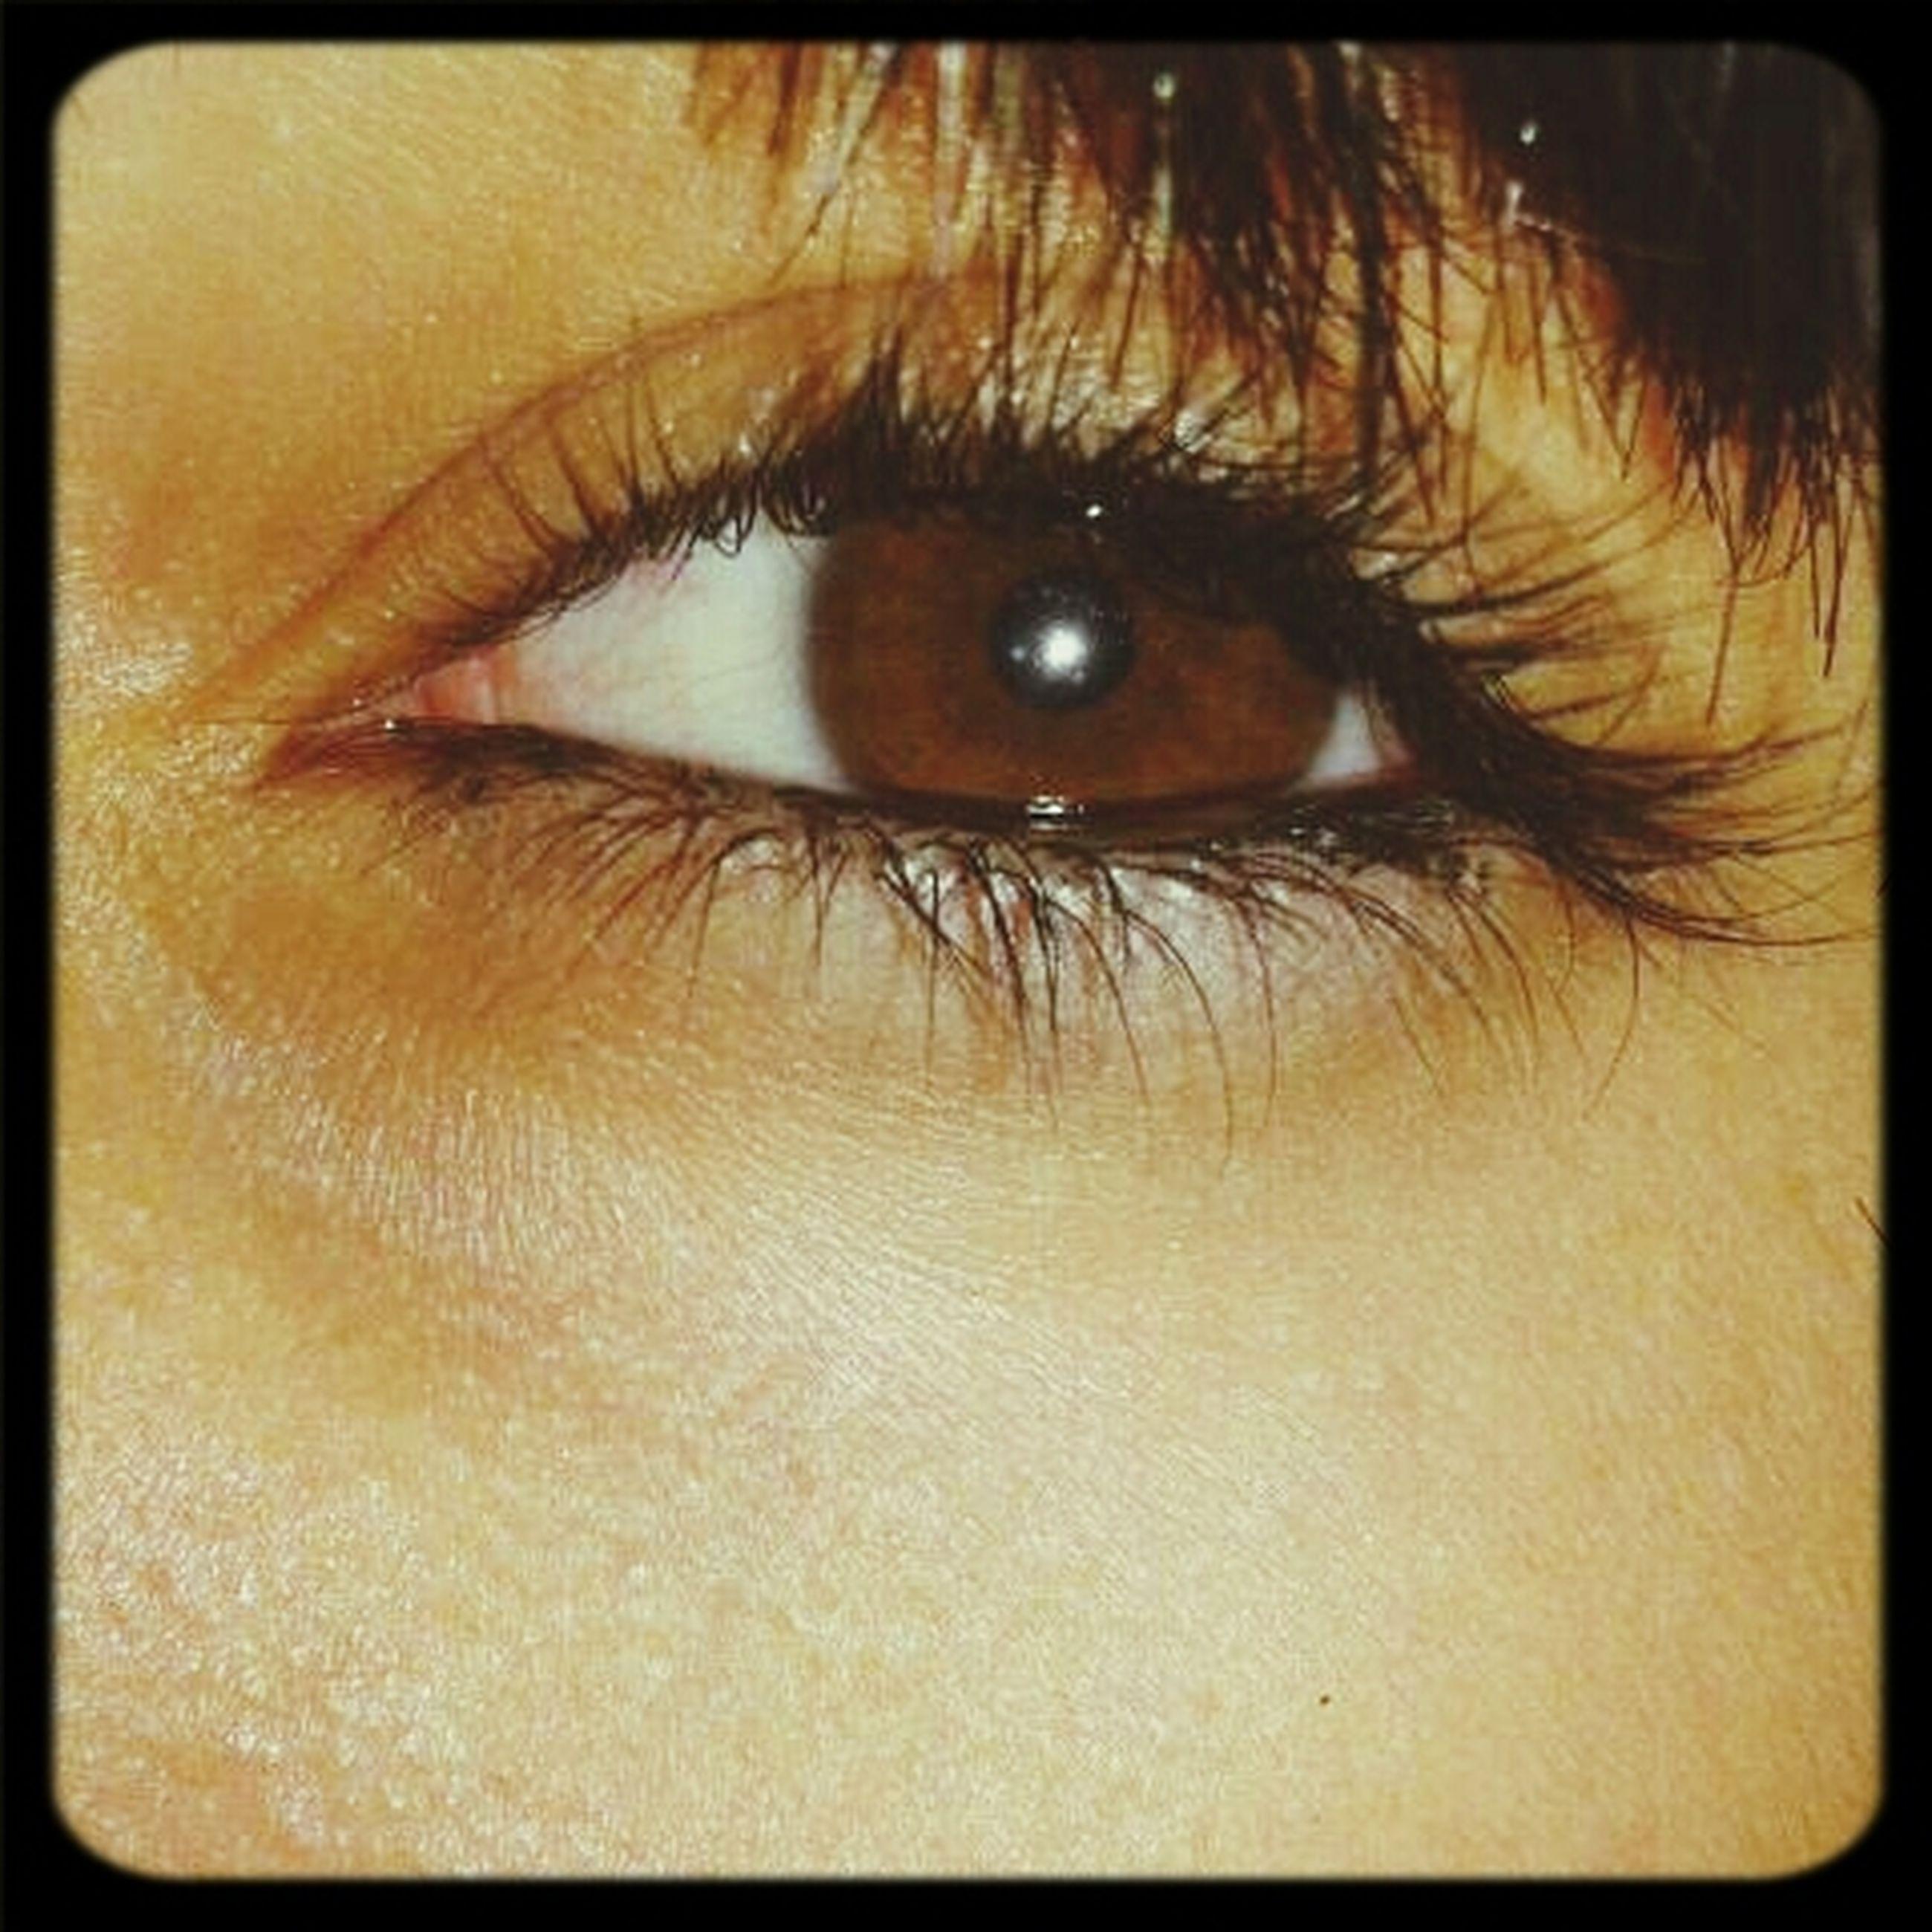 human eye, close-up, eyelash, transfer print, extreme close-up, eyesight, sensory perception, auto post production filter, indoors, full frame, human skin, part of, extreme close up, portrait, looking at camera, eyeball, iris - eye